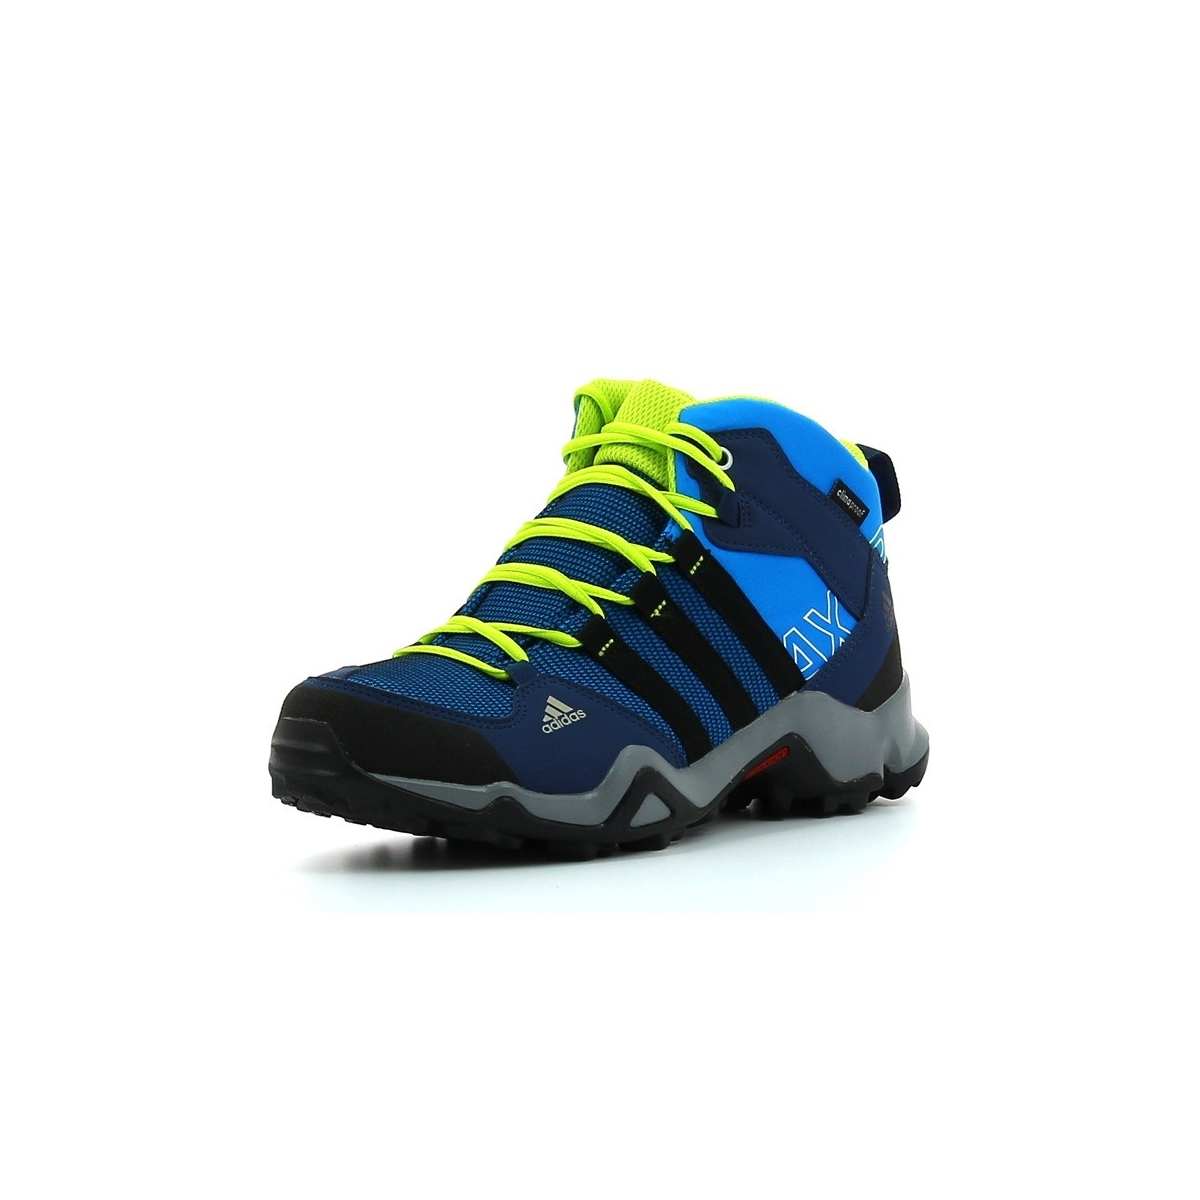 Chaussures De Randonnee Adidas Ax2 Mid Cp Bleu Noir